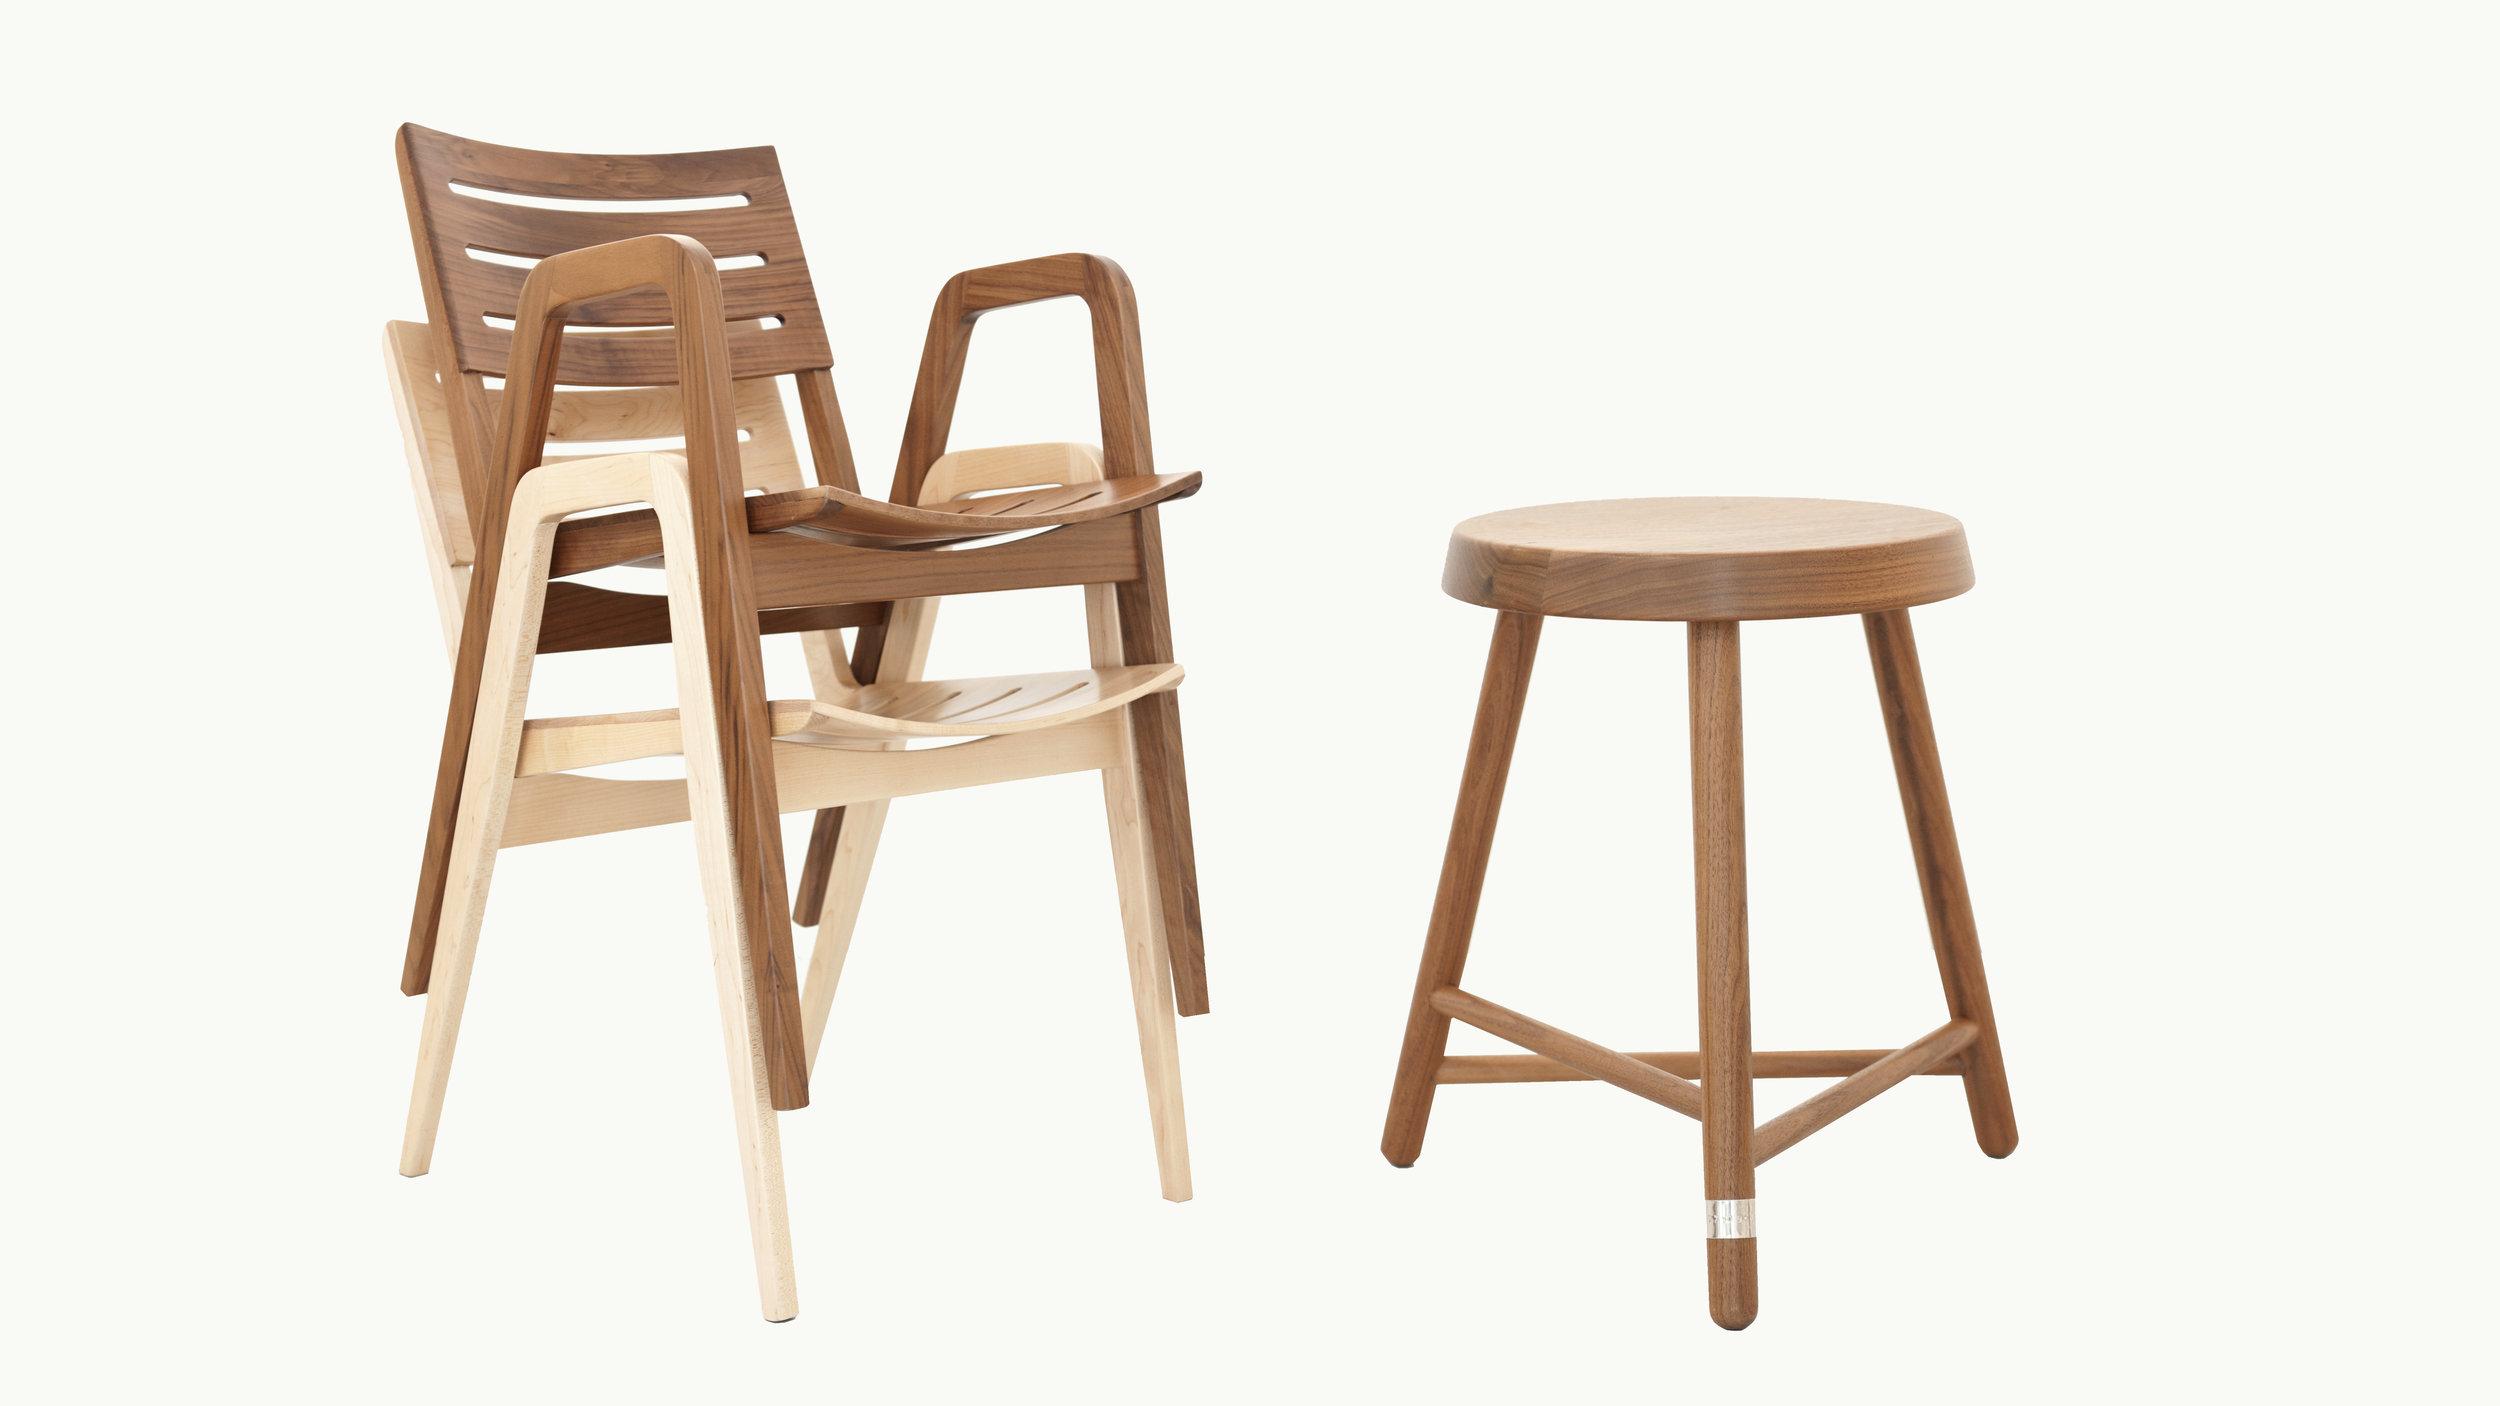 PlantandMoss_Bistro_Chairs Stacked_and_Companion_Stool.jpg